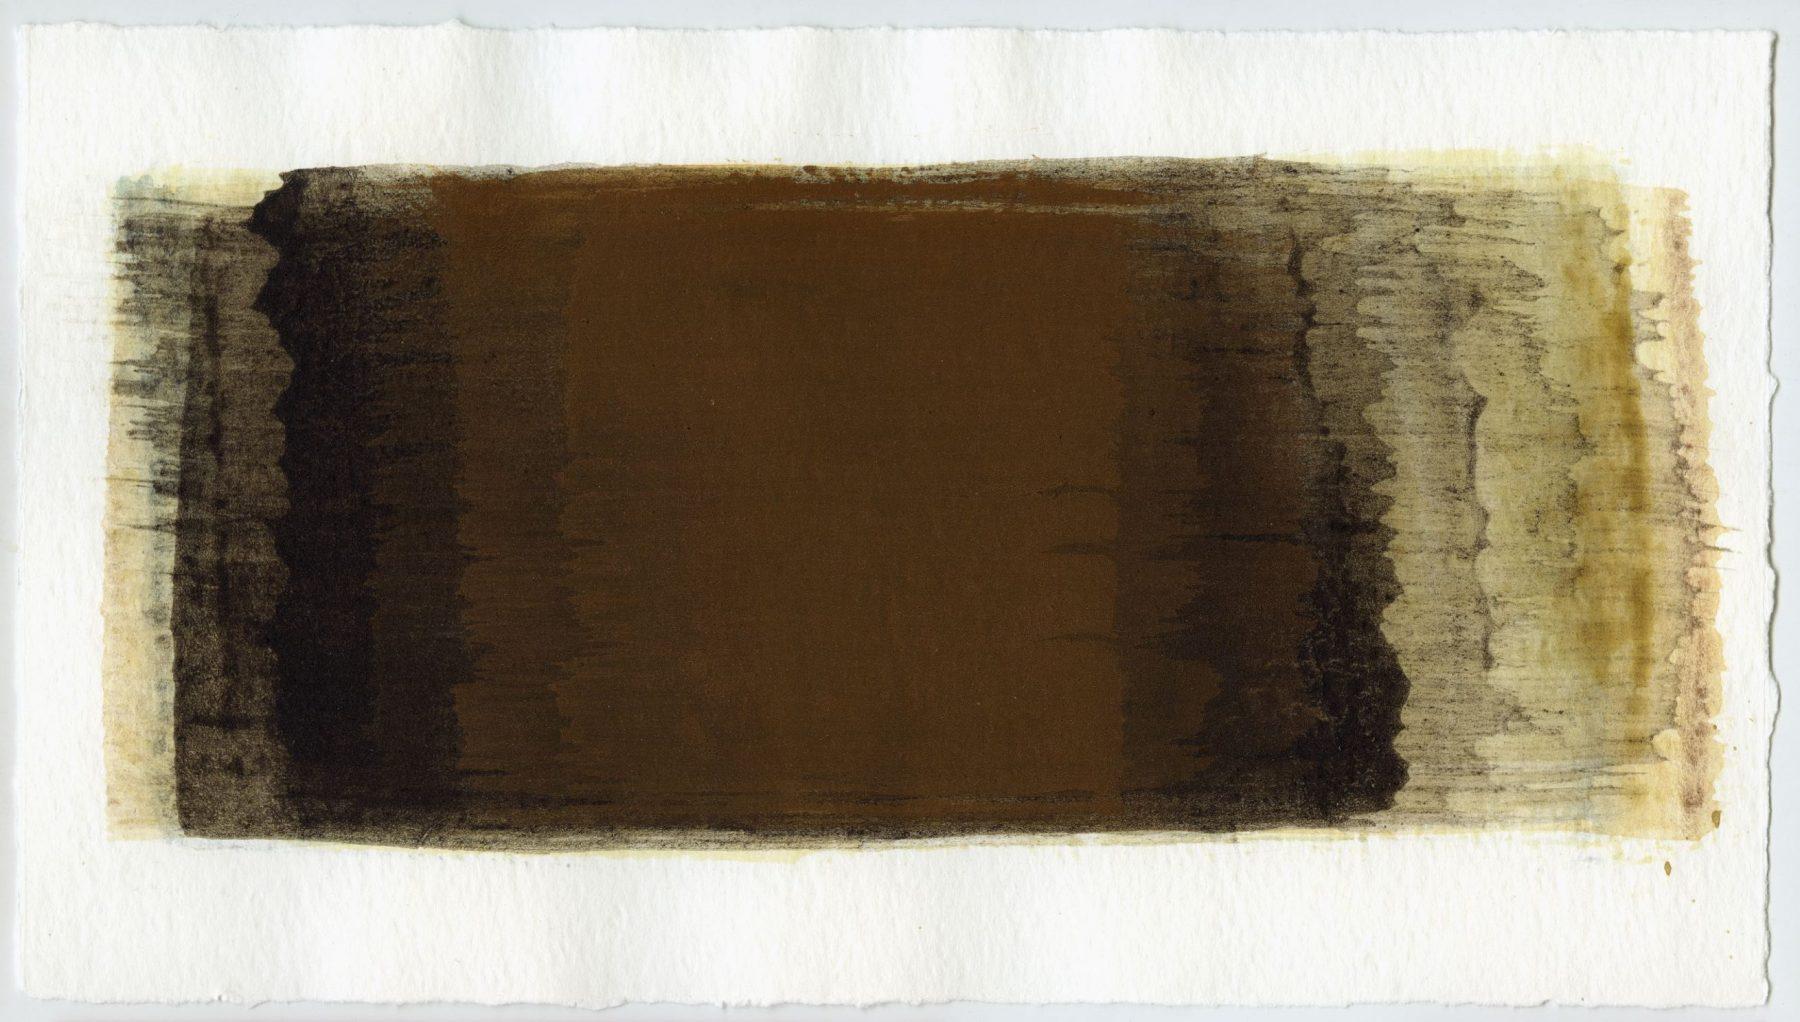 Brush stroke no. 61 - Selfmade pigment: IJzeroer, Mortelse oker, Slingerpad bruin, IJzeroer